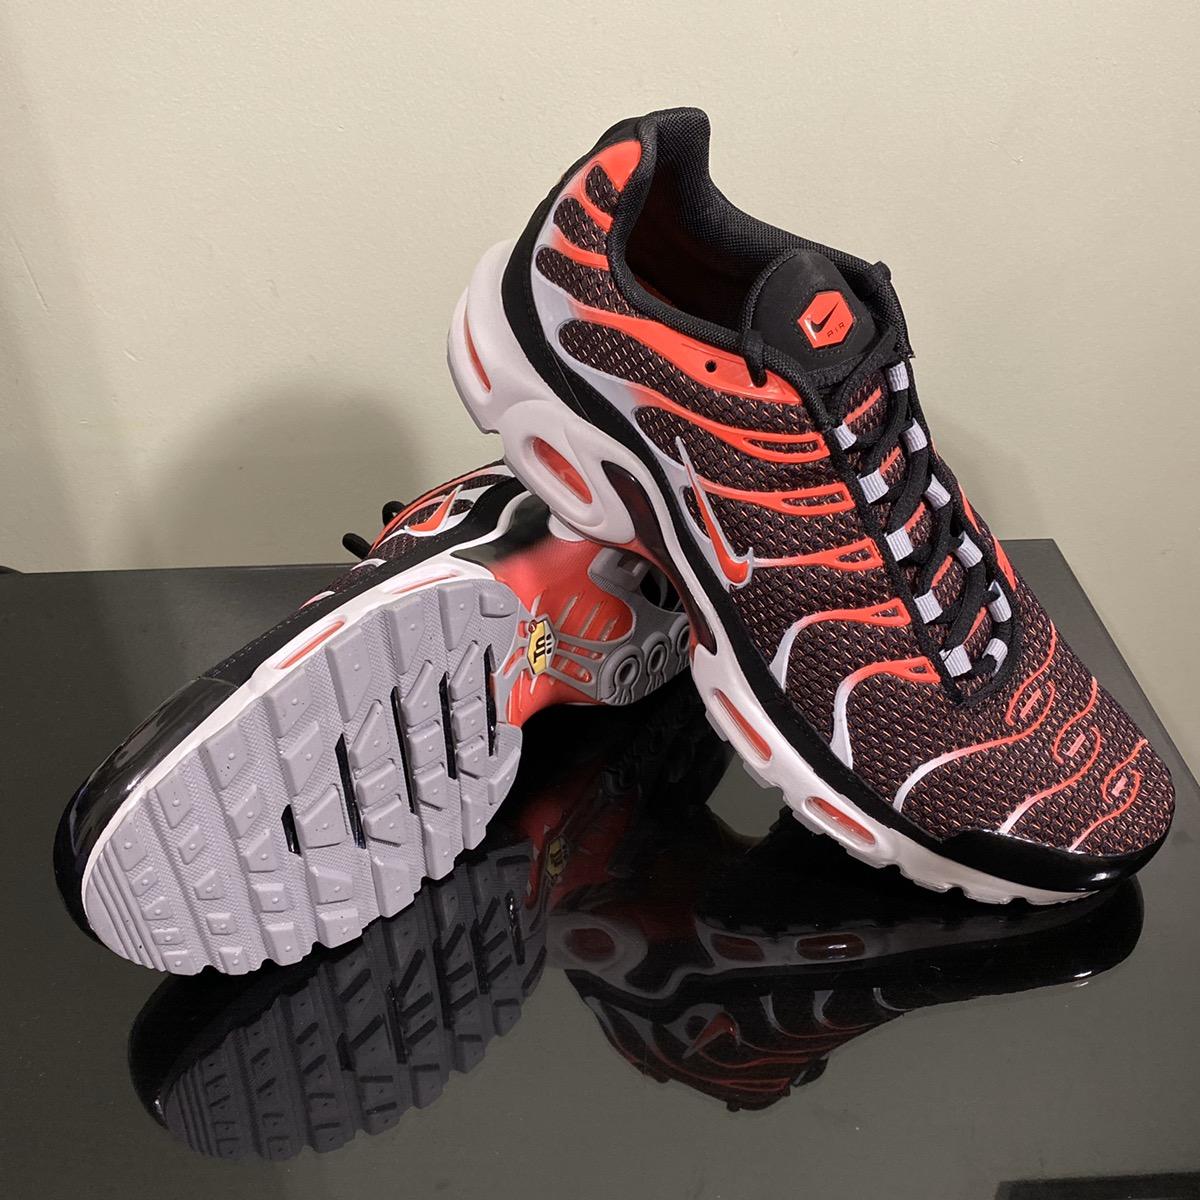 Nike Nike TN Air Max Plus Hot Lava SZ. 11.5